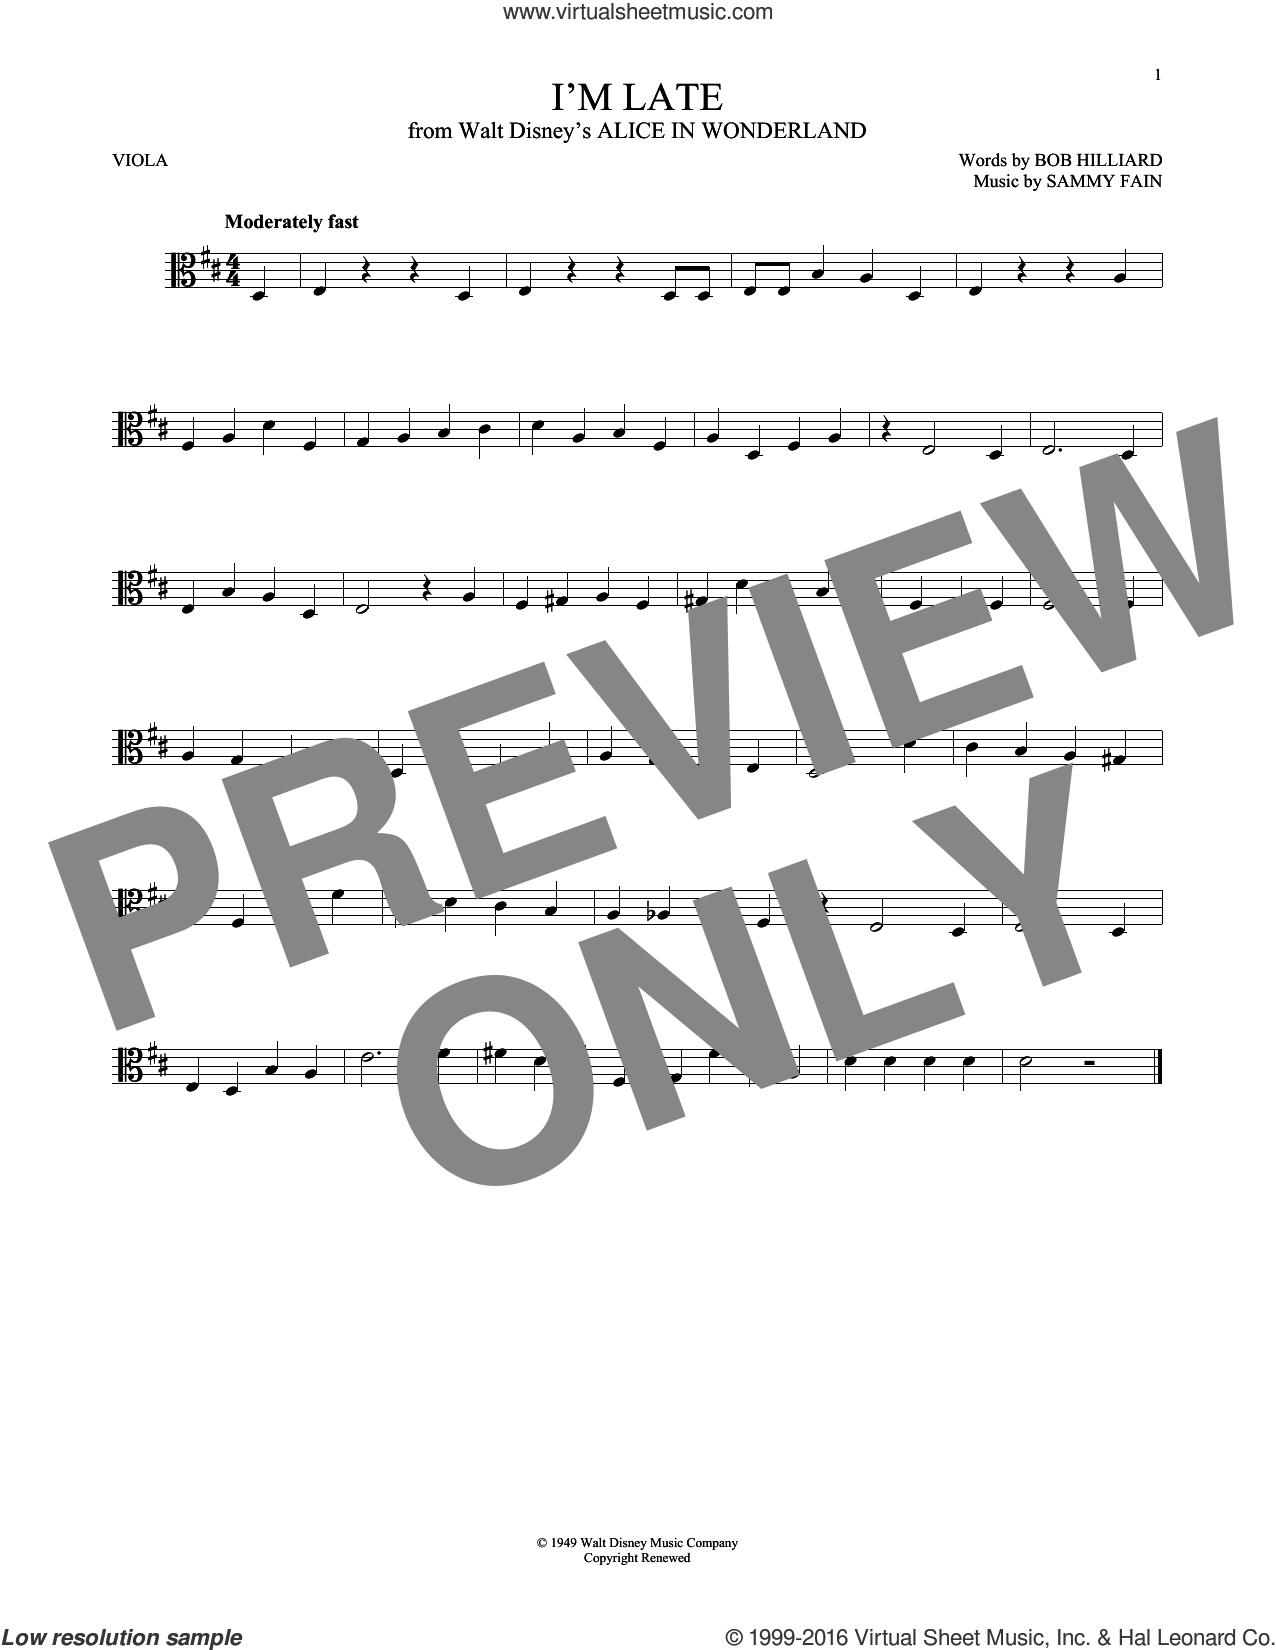 I'm Late sheet music for viola solo by Sammy Fain and Bob Hilliard, intermediate skill level